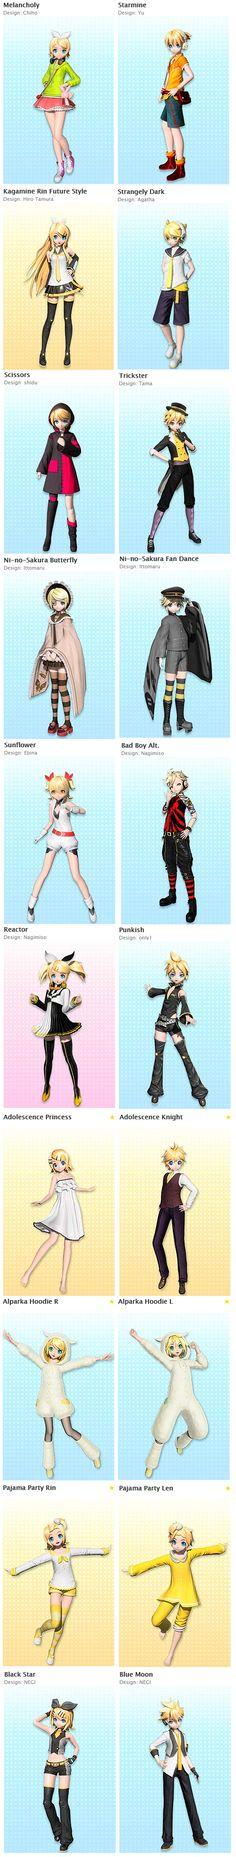 Rin and Len-Module Pairings